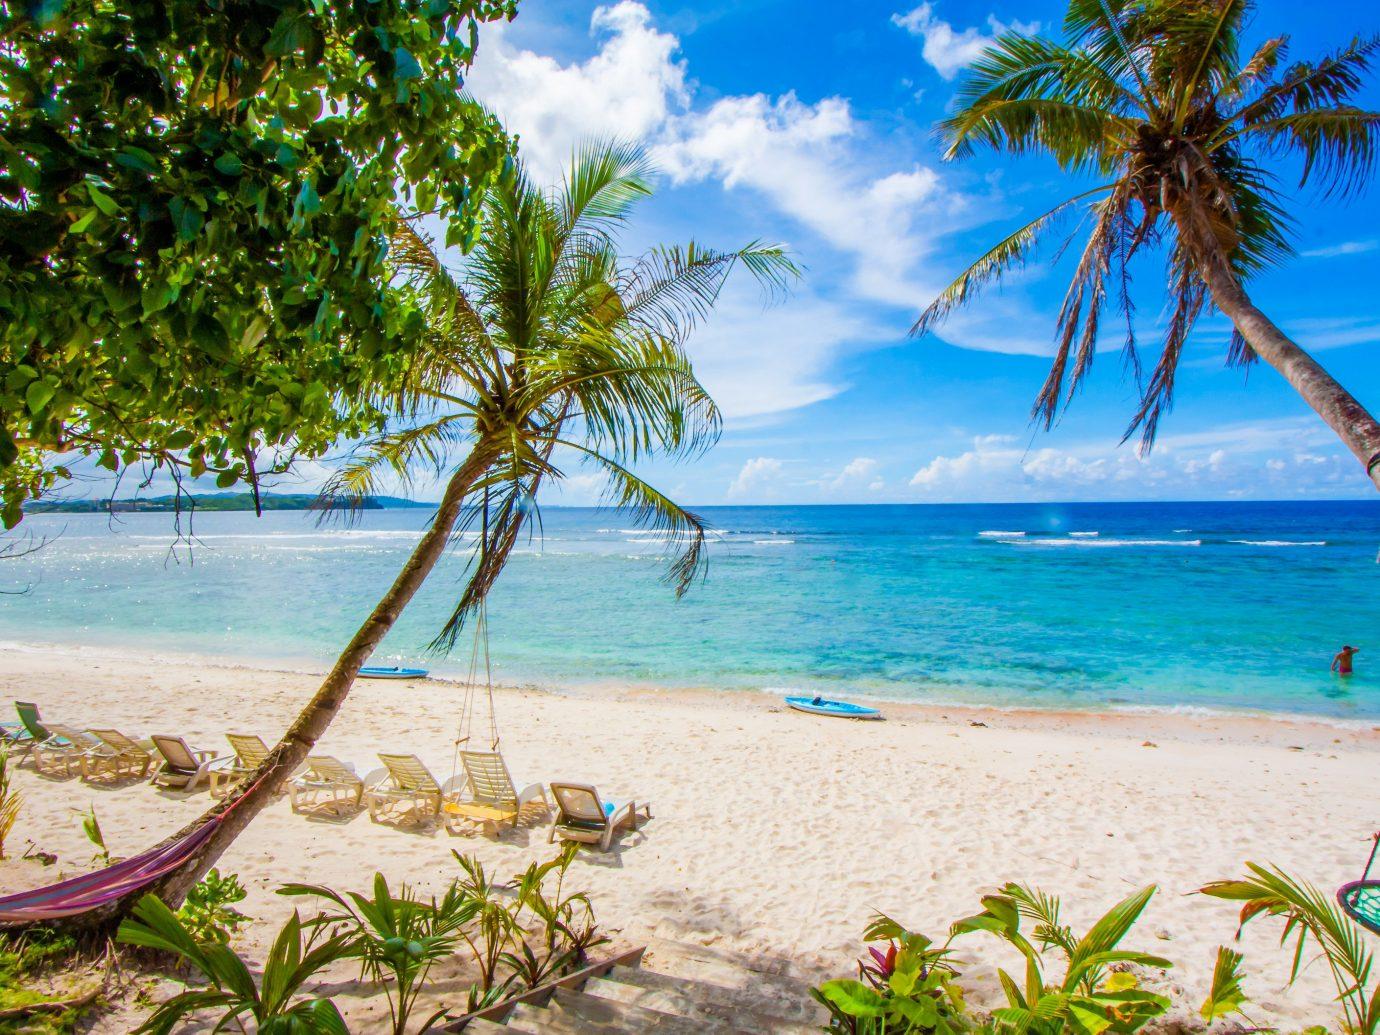 Trip Ideas tree outdoor water palm Beach shore body of water caribbean Sea vacation Ocean tropics Nature arecales Coast Island Lagoon bay palm family plant shade lined sunny sandy Resort